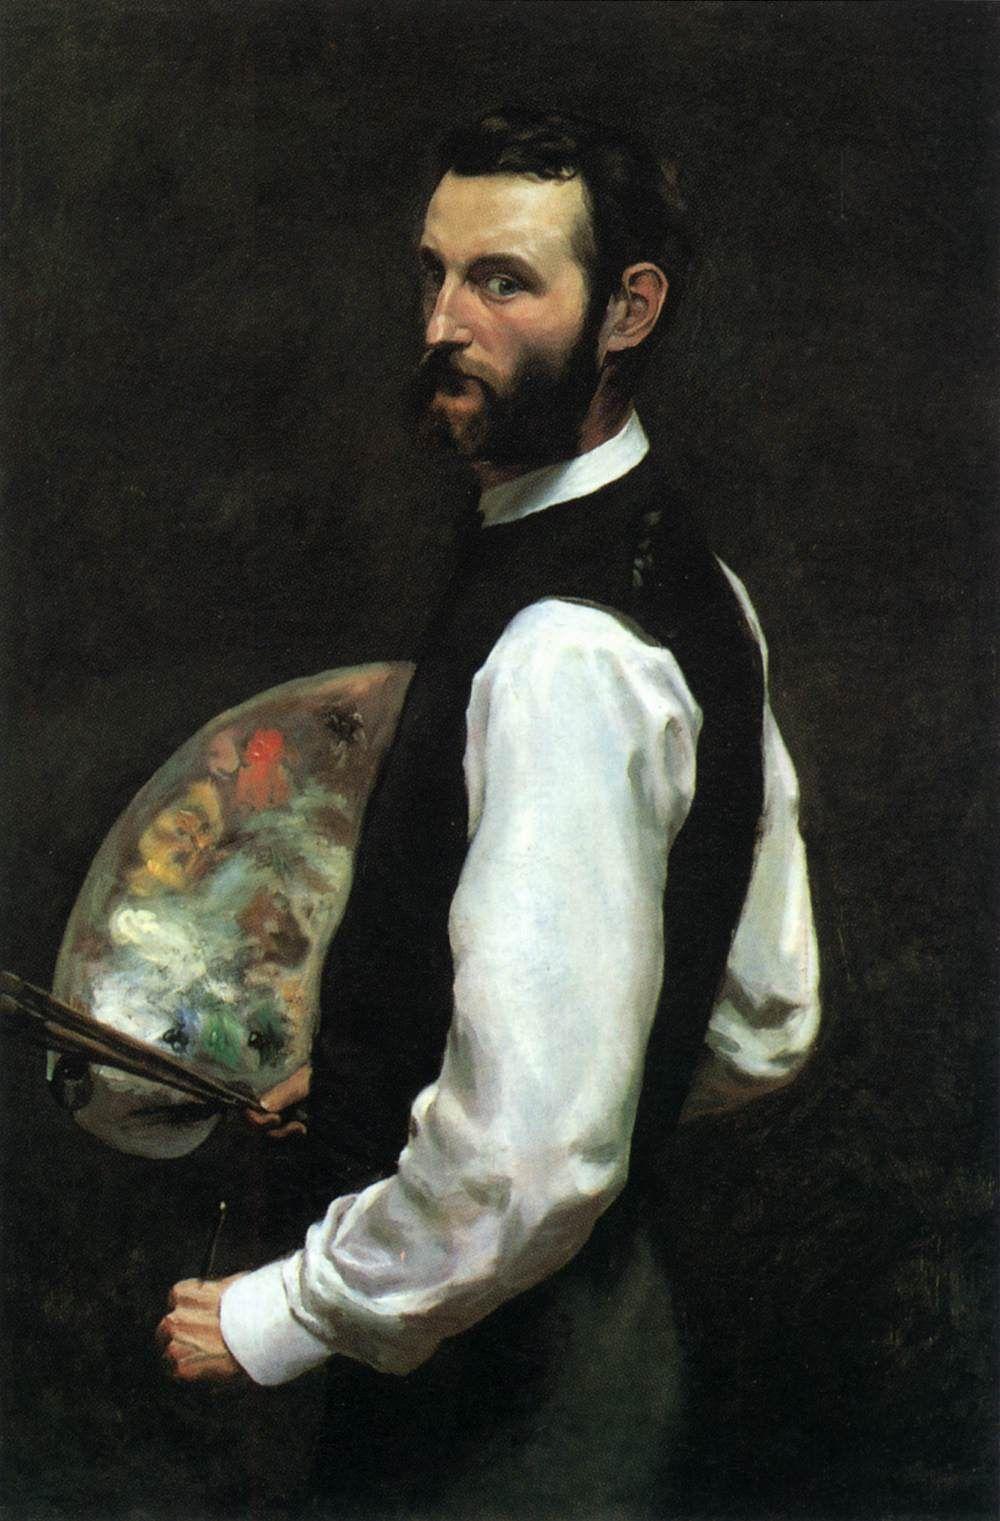 Jean Frédéric Bazille (December 6, 1841 November 28